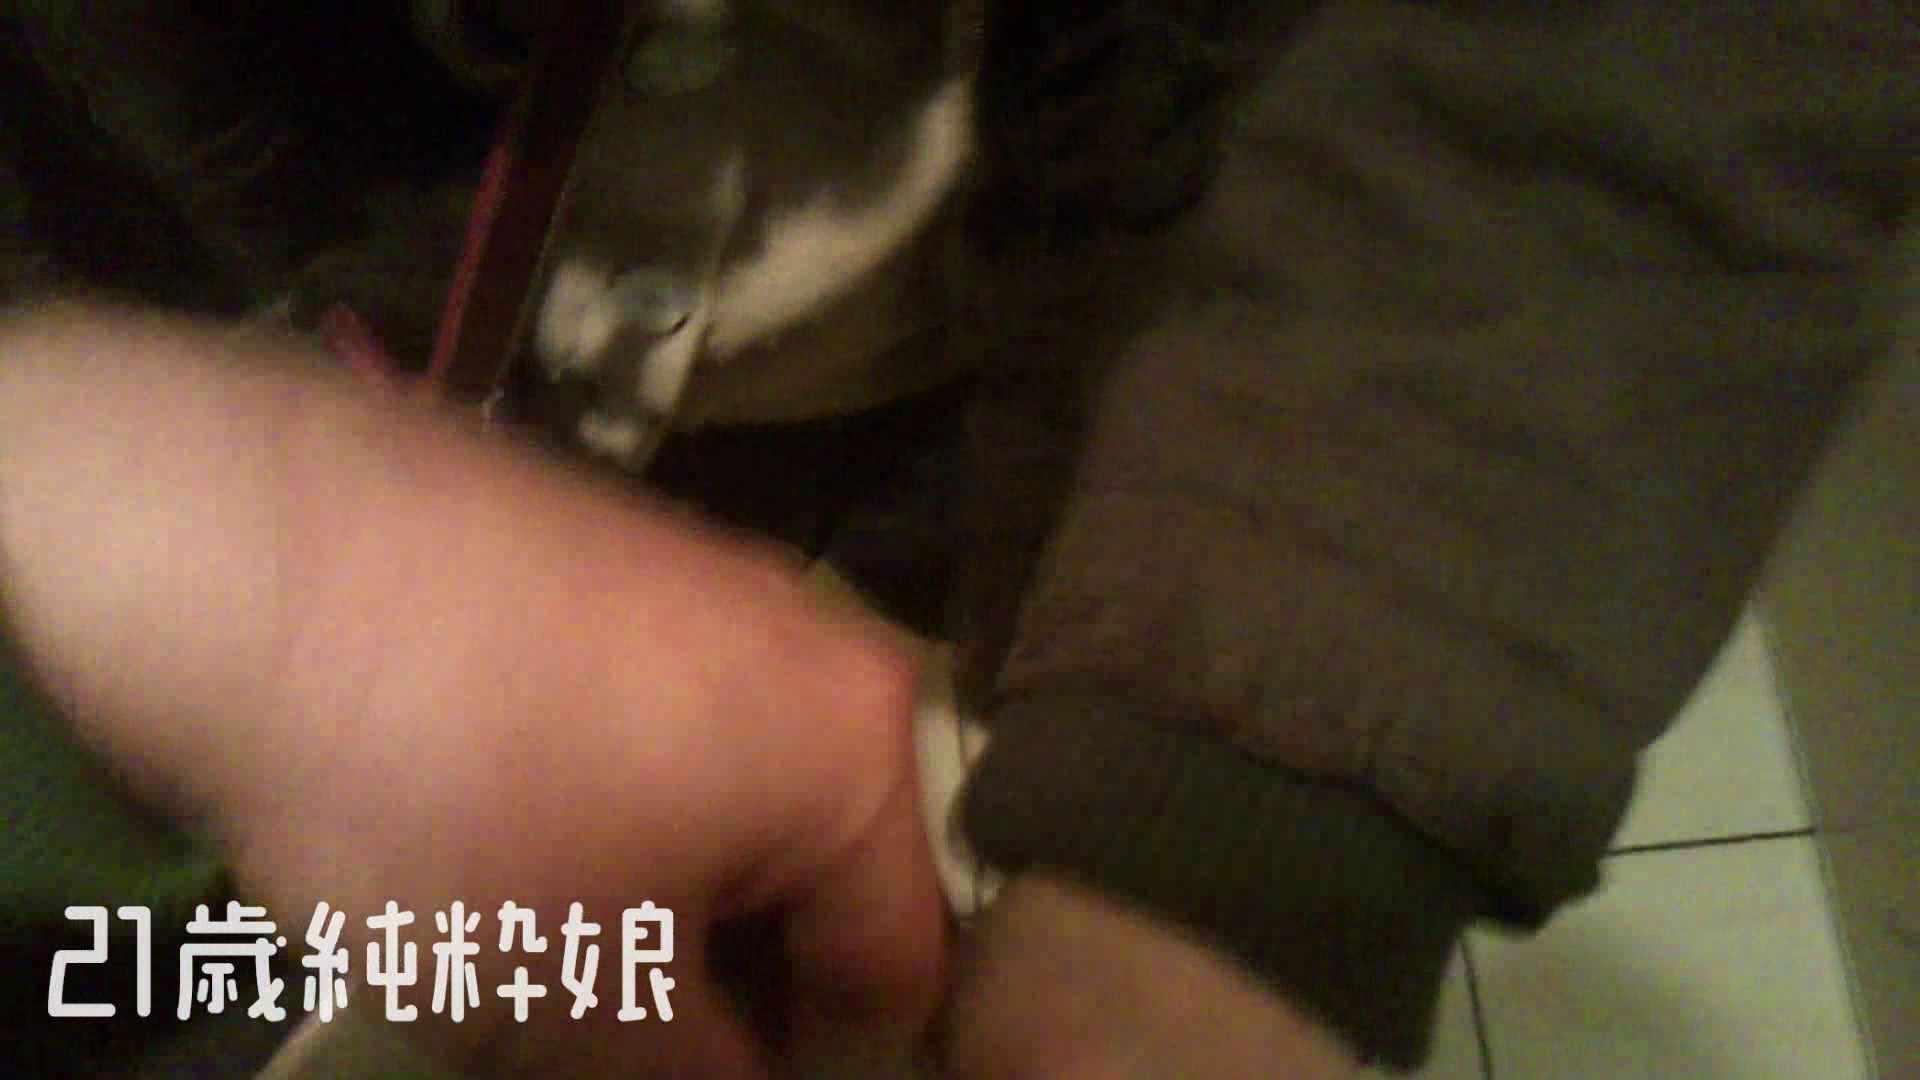 Gカップ21歳純粋嬢第2弾Vol.5 OLヌード天国  110PIX 28